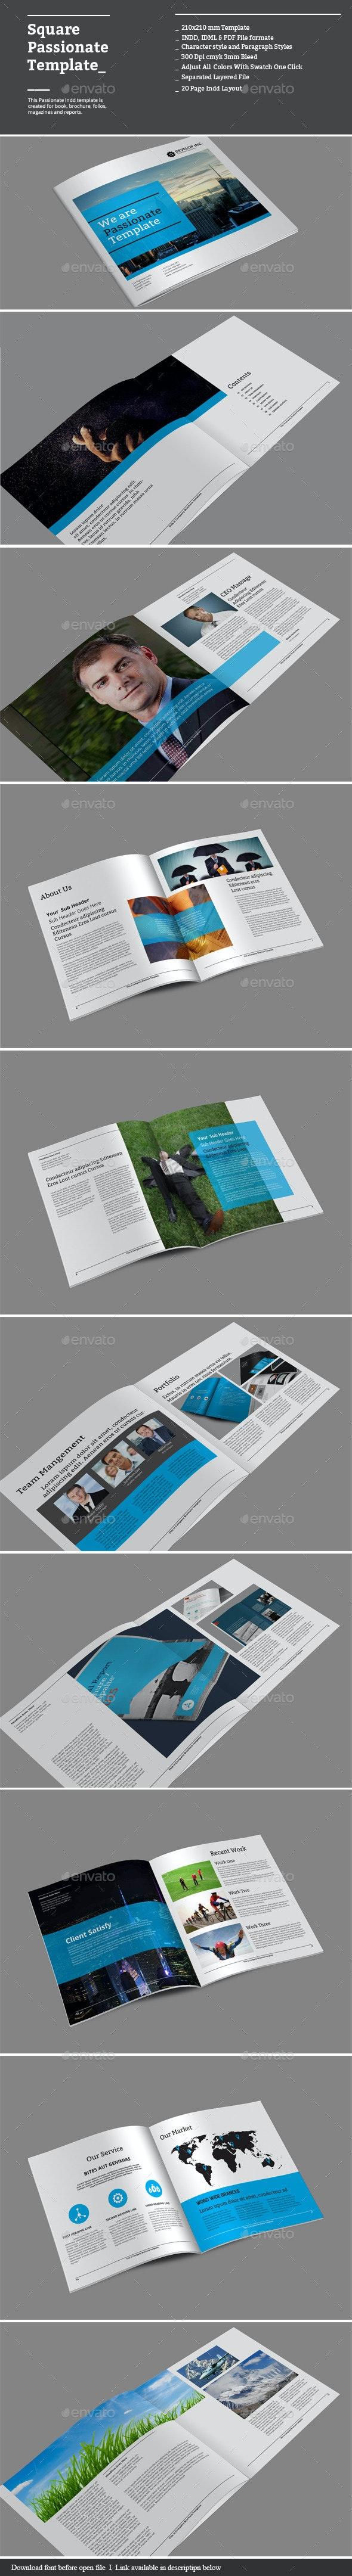 Square Passionate Templates - Corporate Brochures